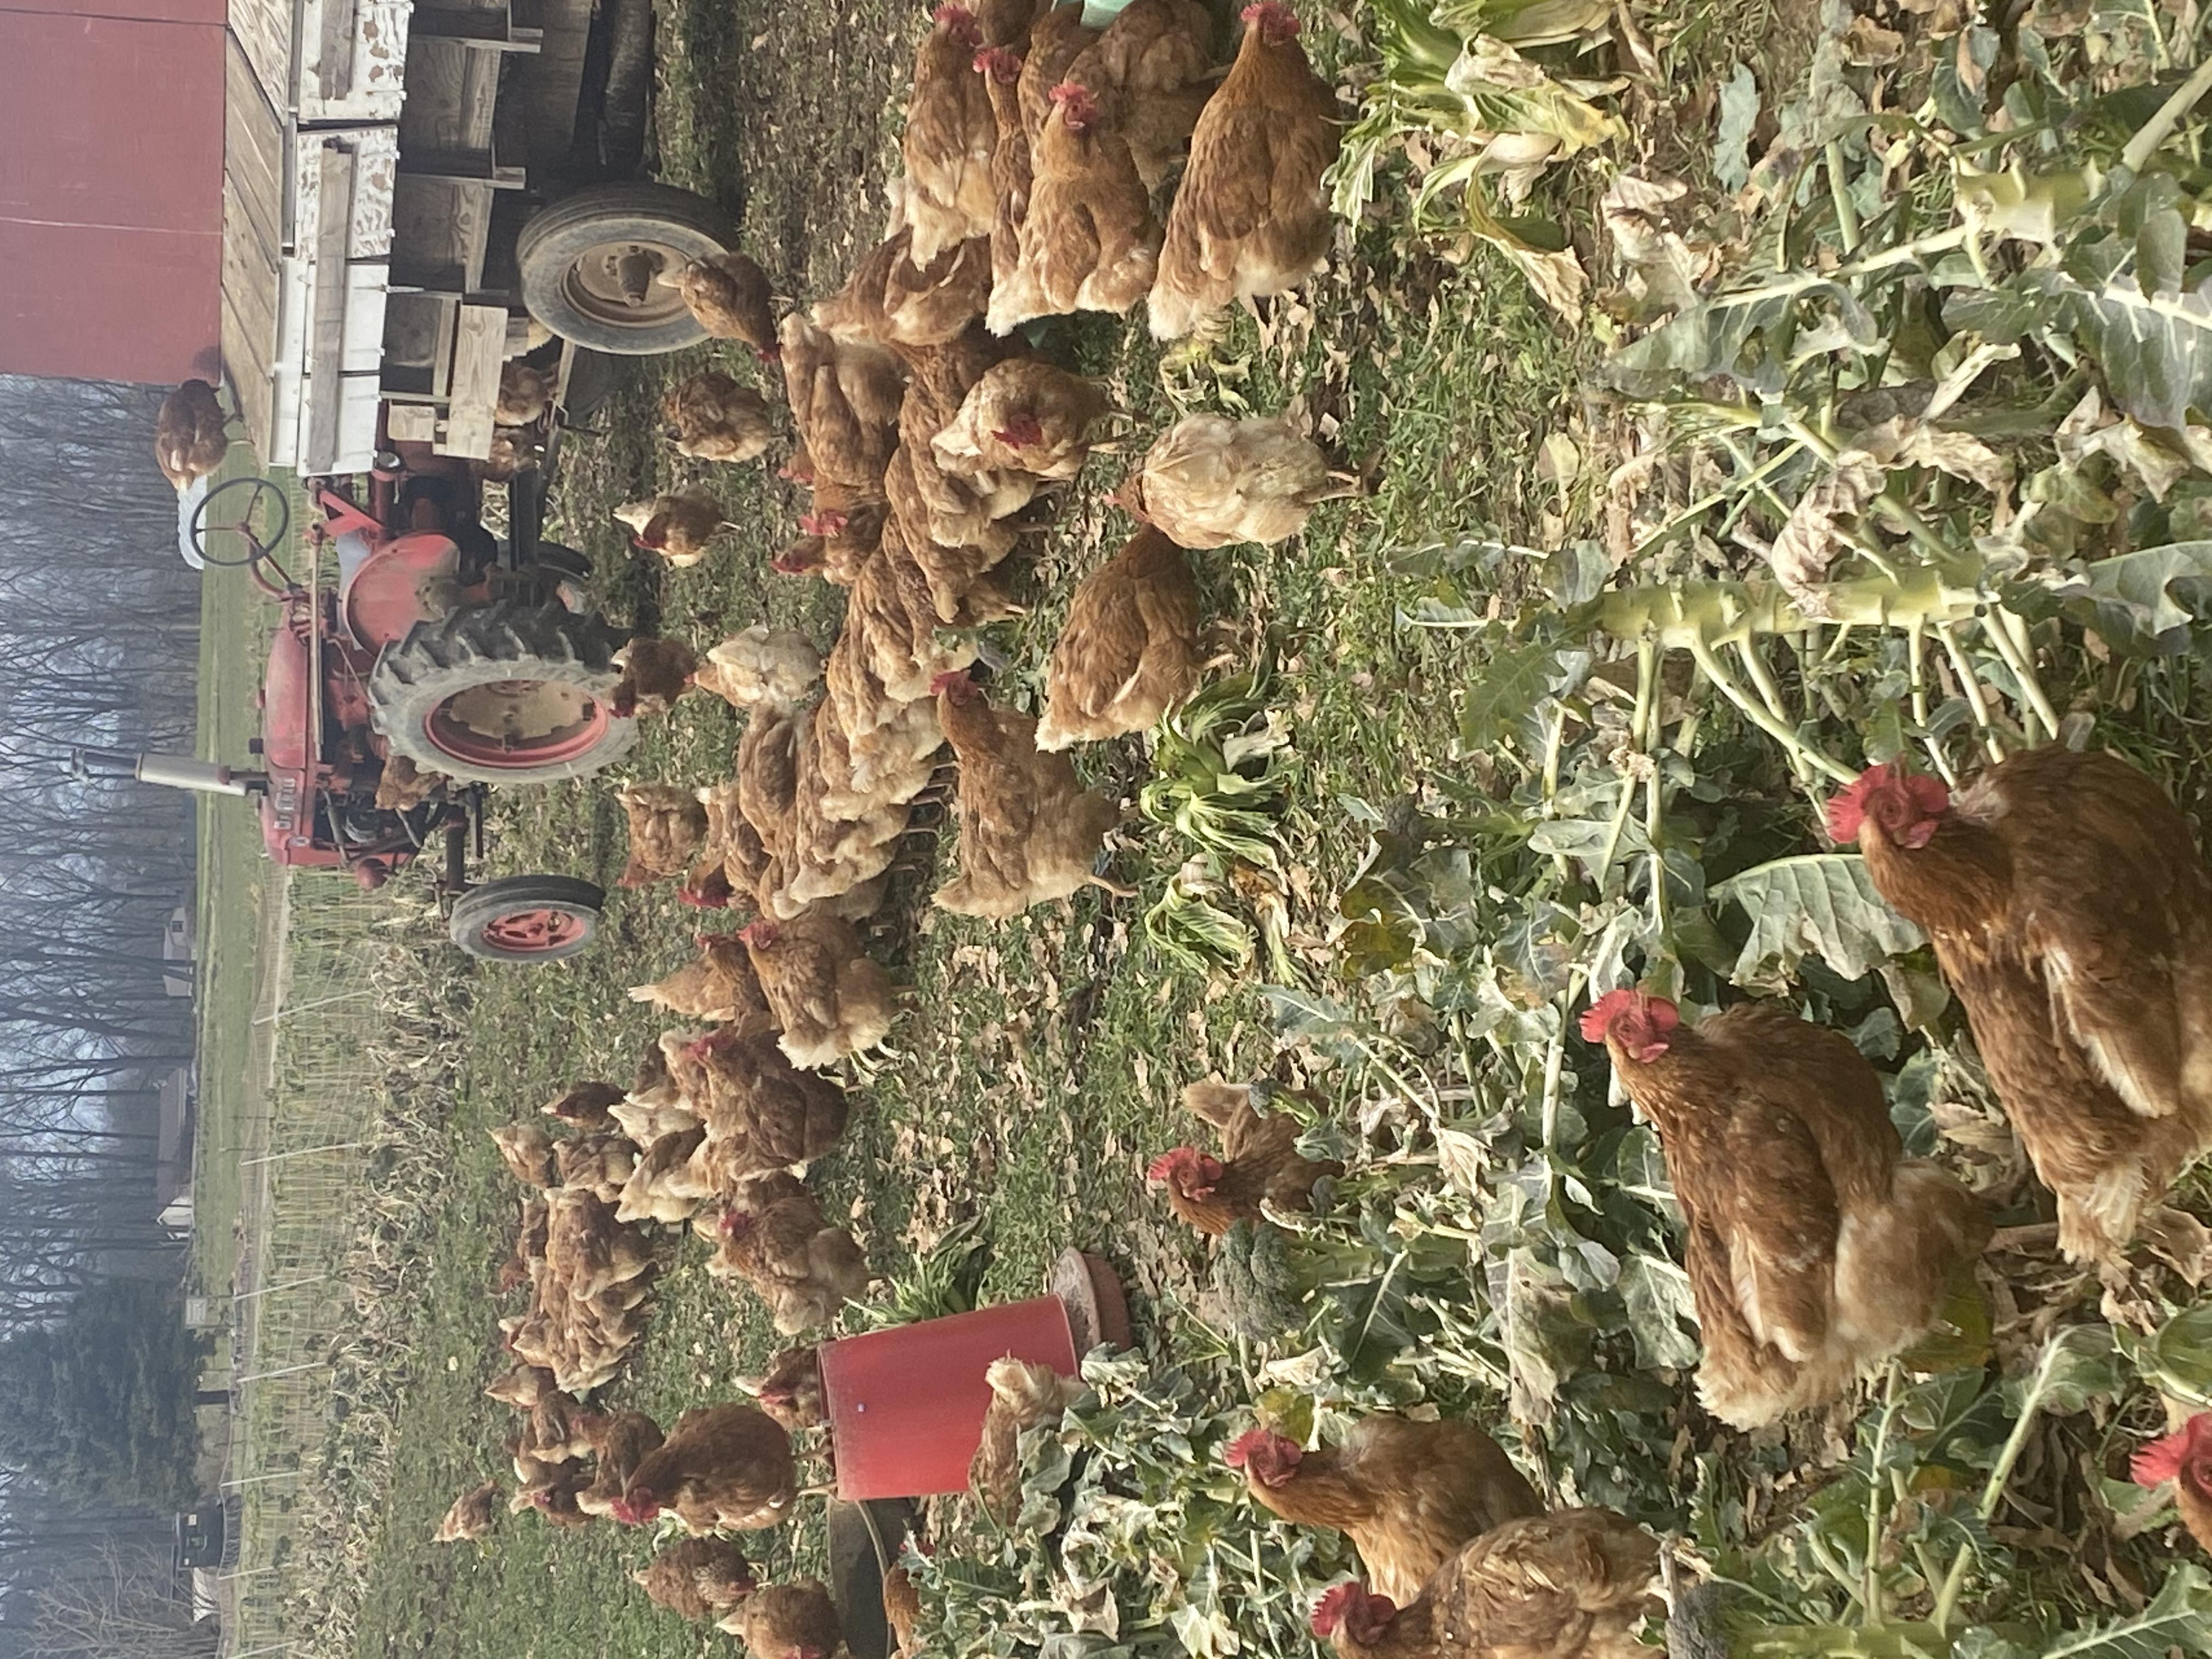 Farm Happenings for Week of January 25, 2021